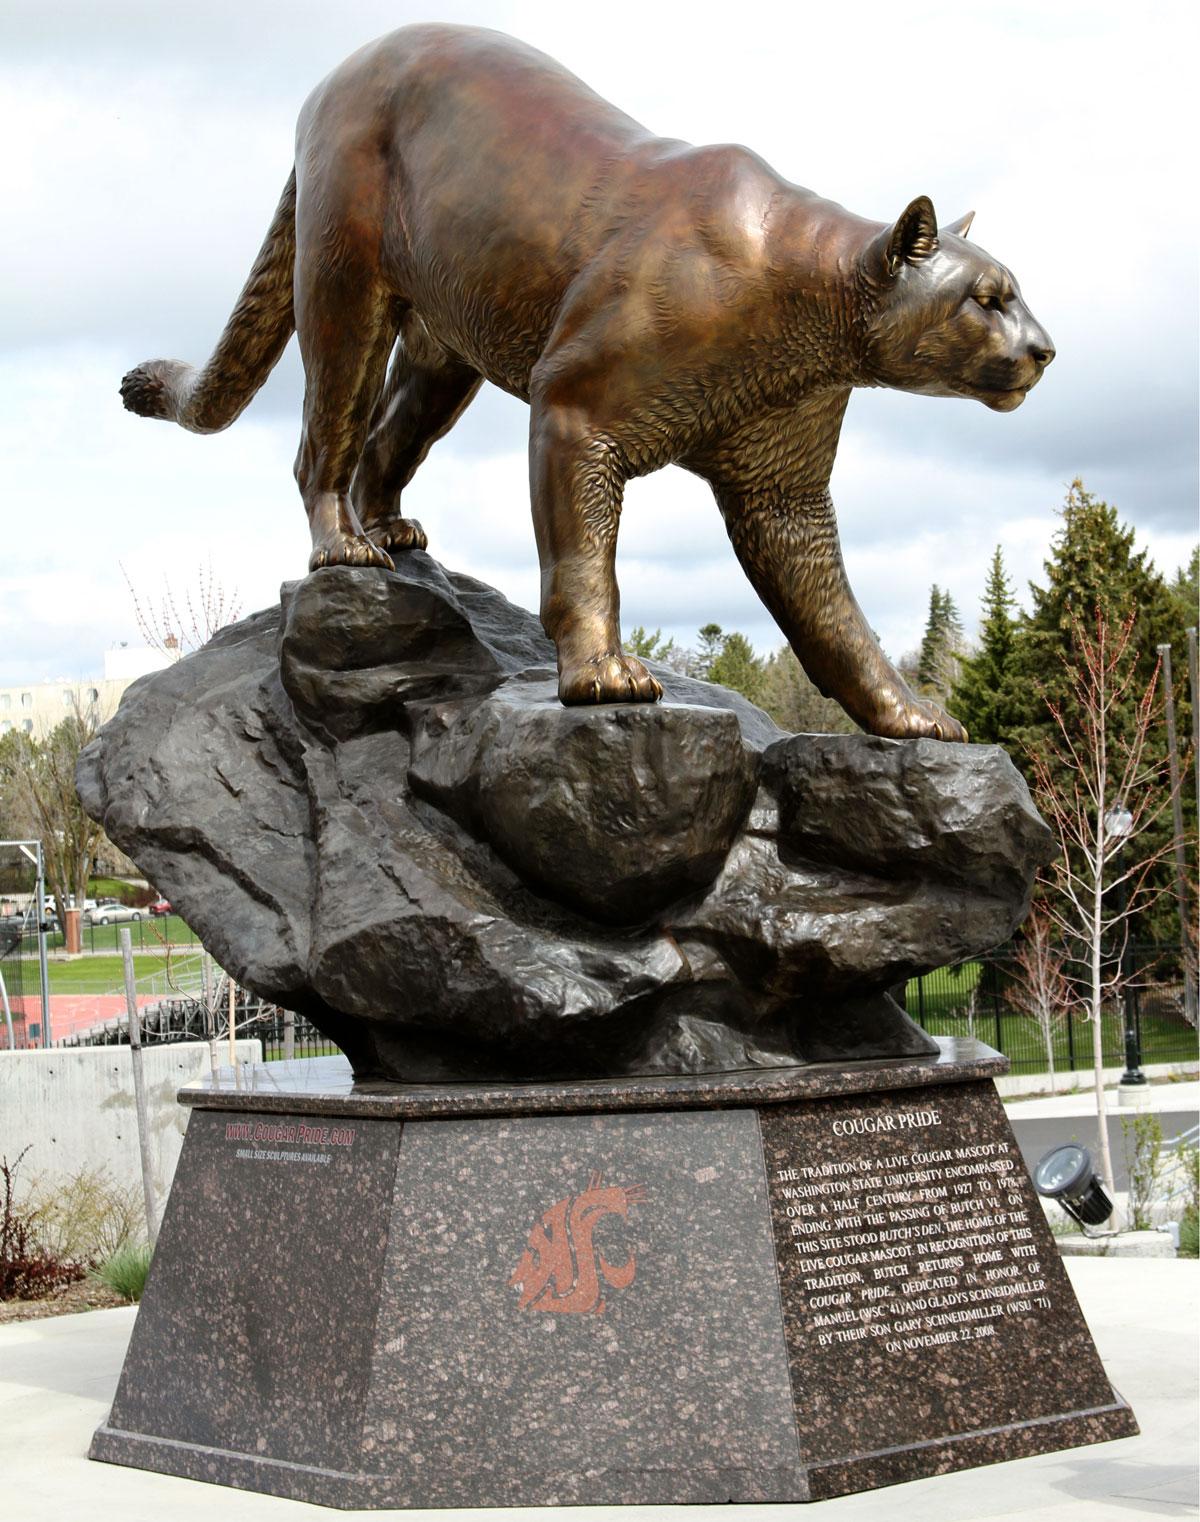 cougar pride bronze cougar mascot university sculpture monument